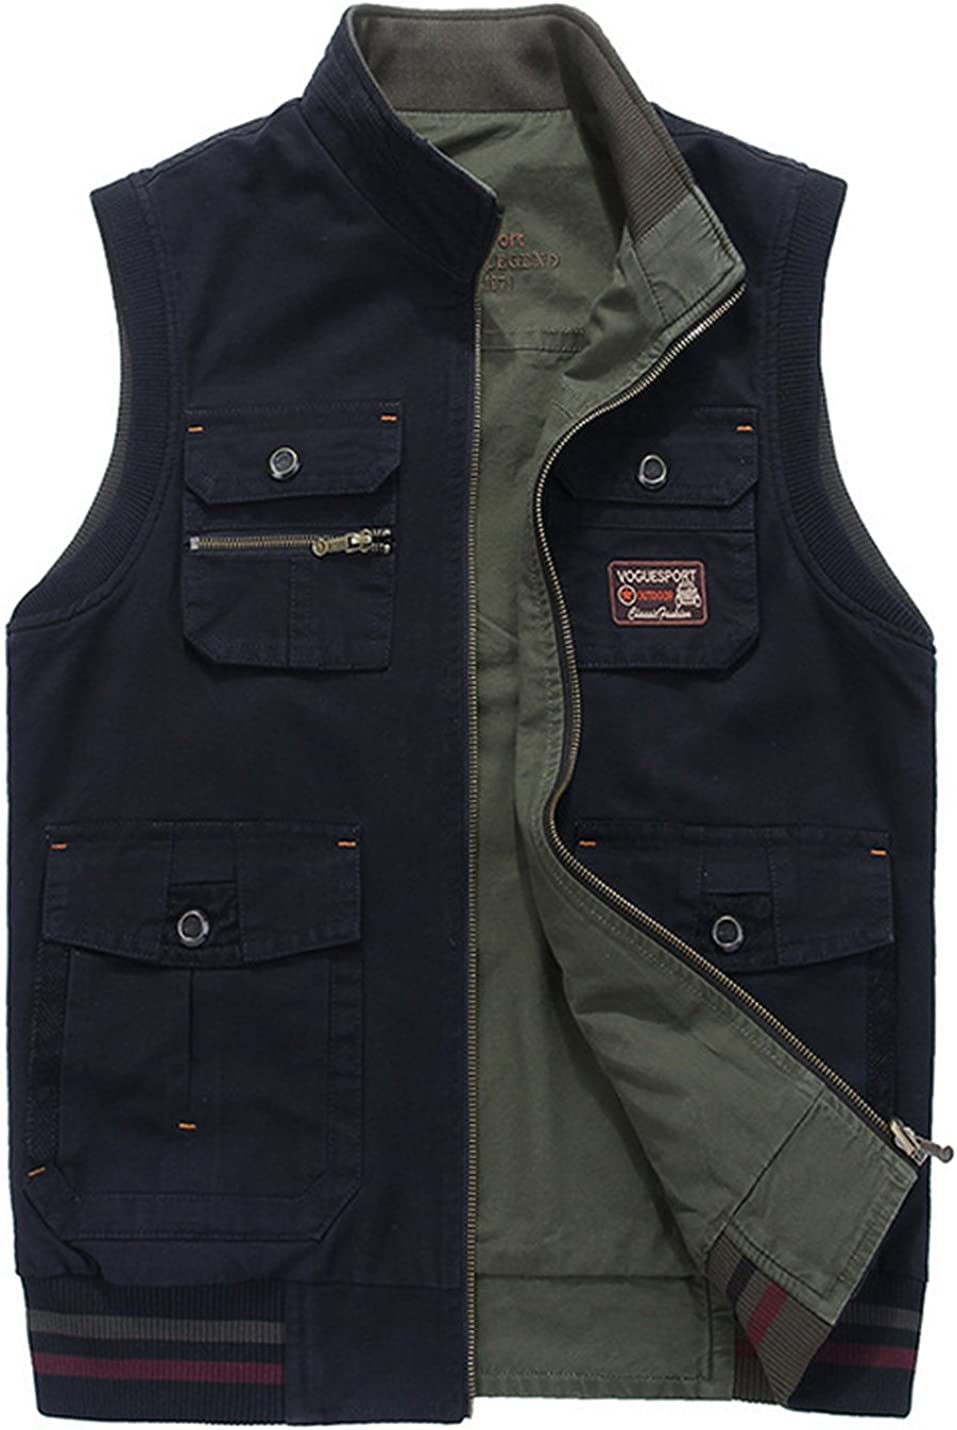 Gihuo Men's Reversible Outdoor Pockets Fishing Safari Travel Vest Jacket